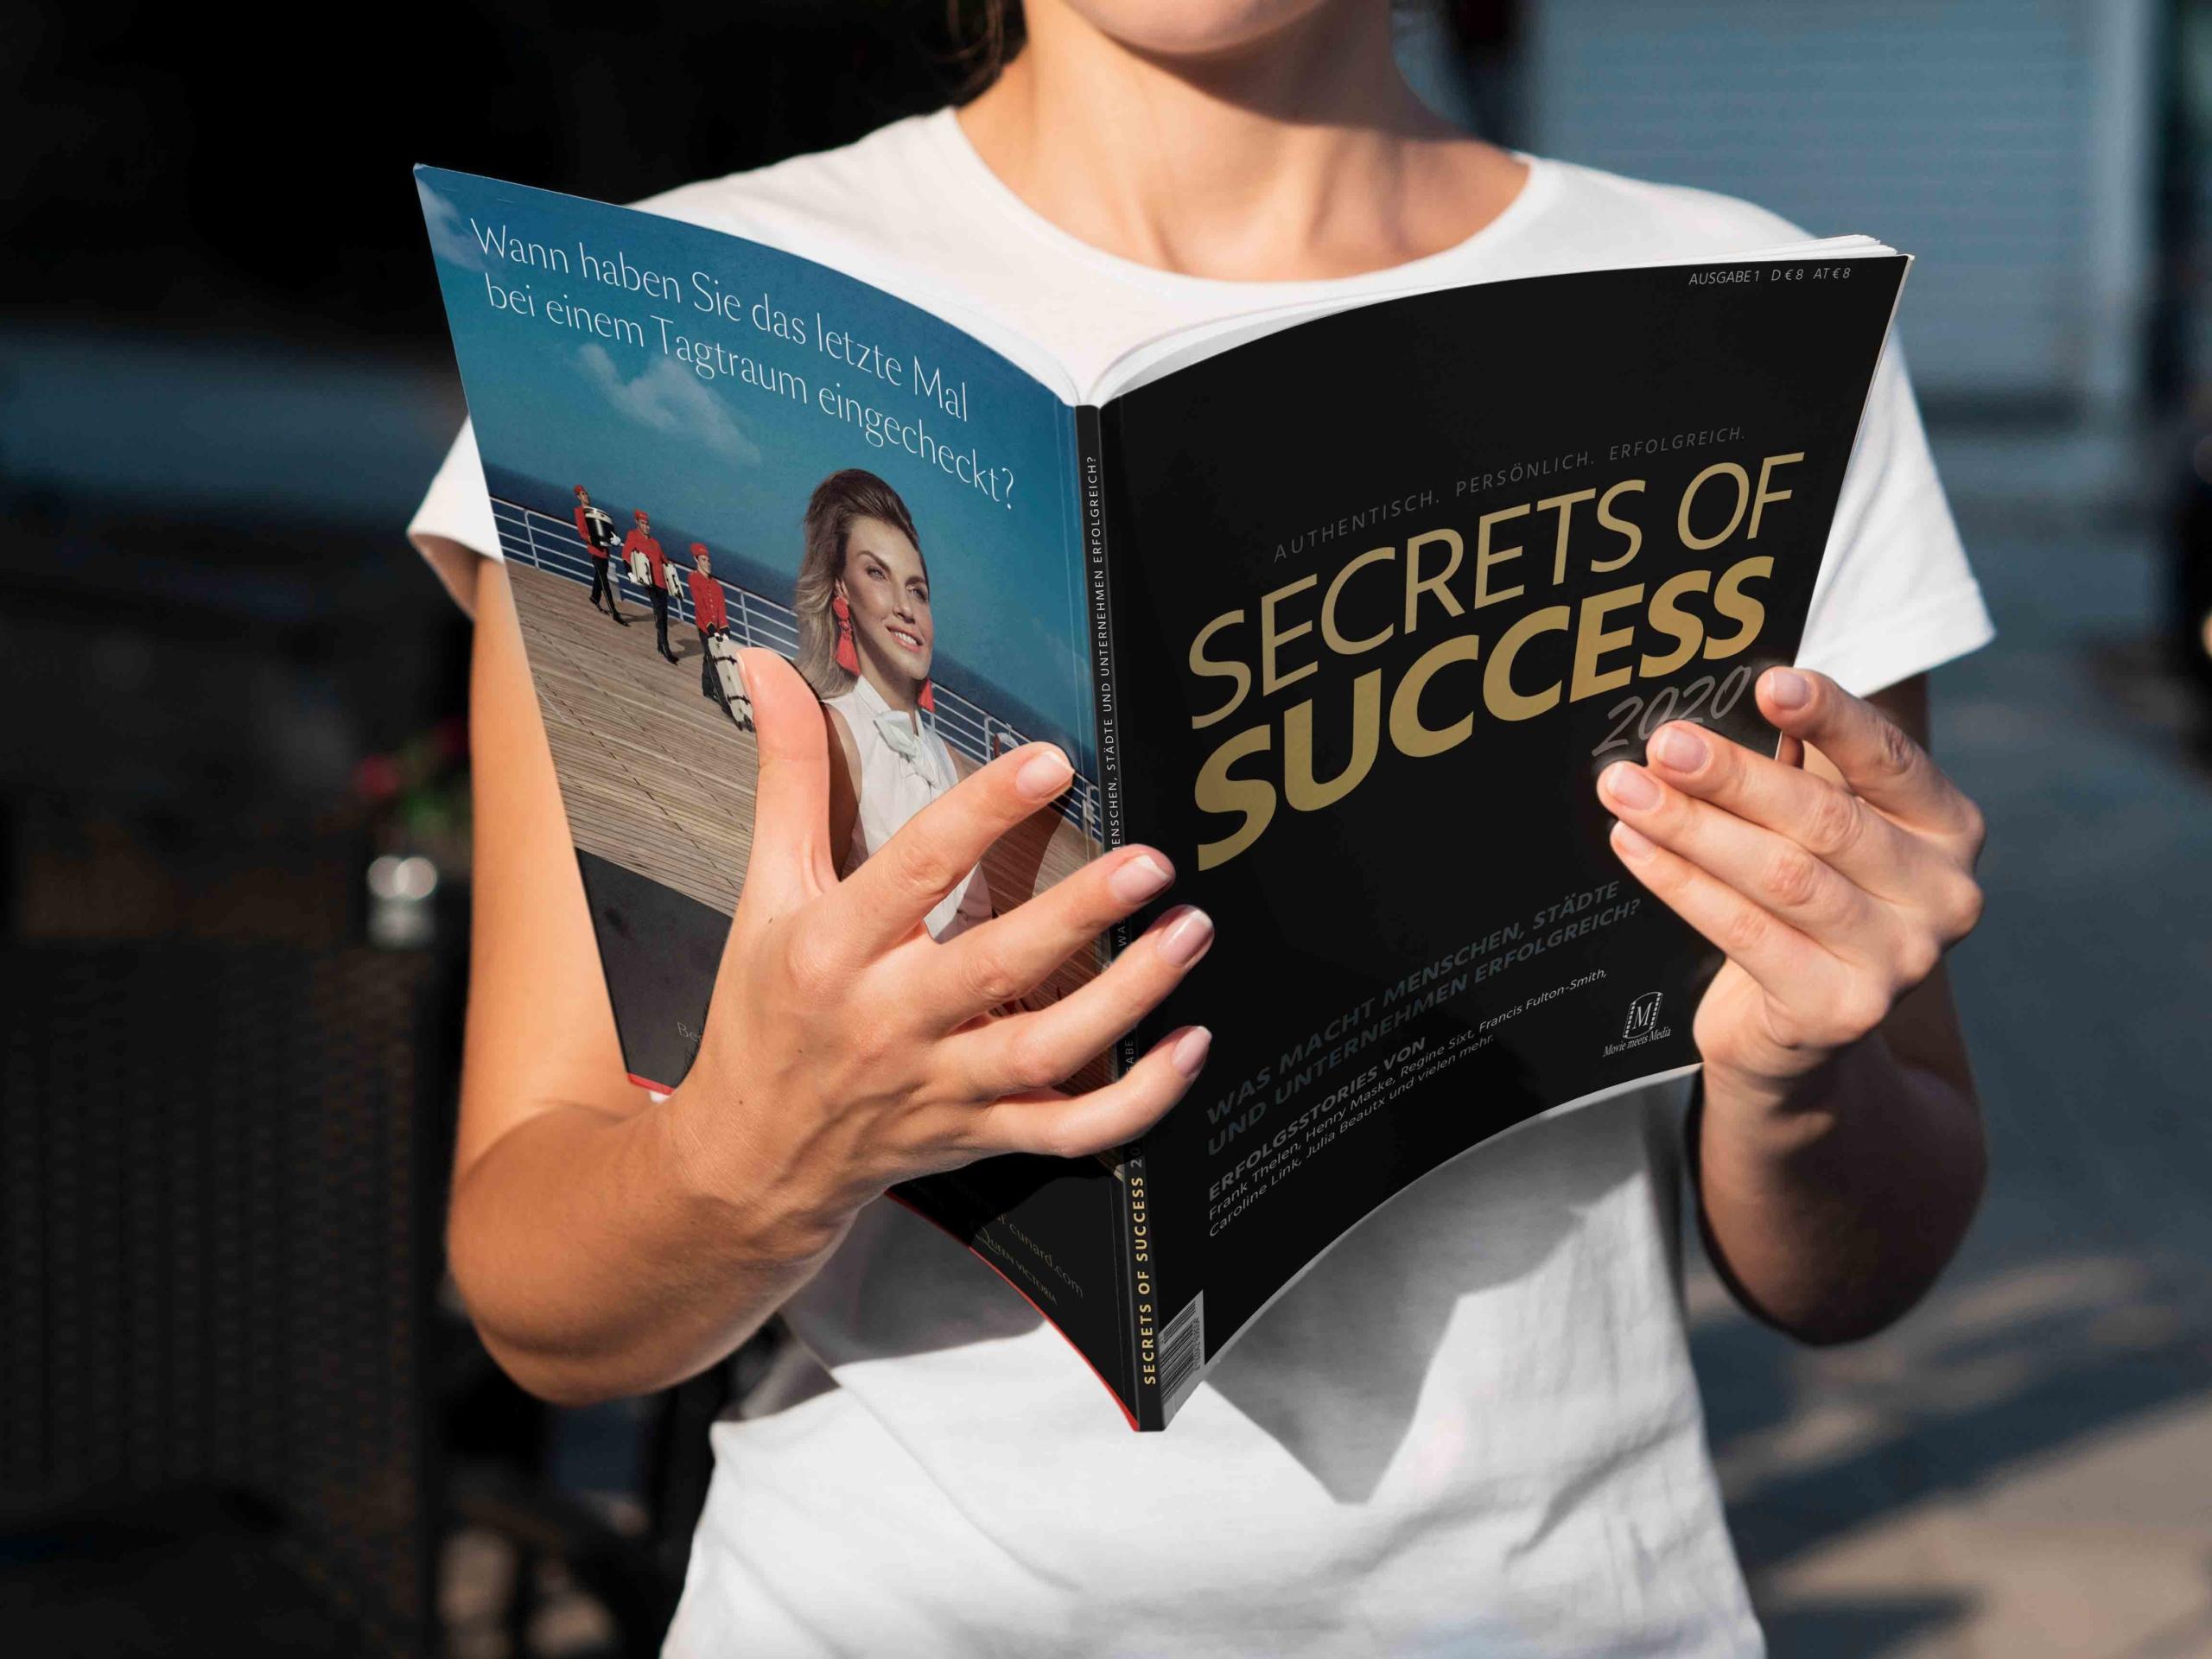 Secrets of Success Zeitschrift